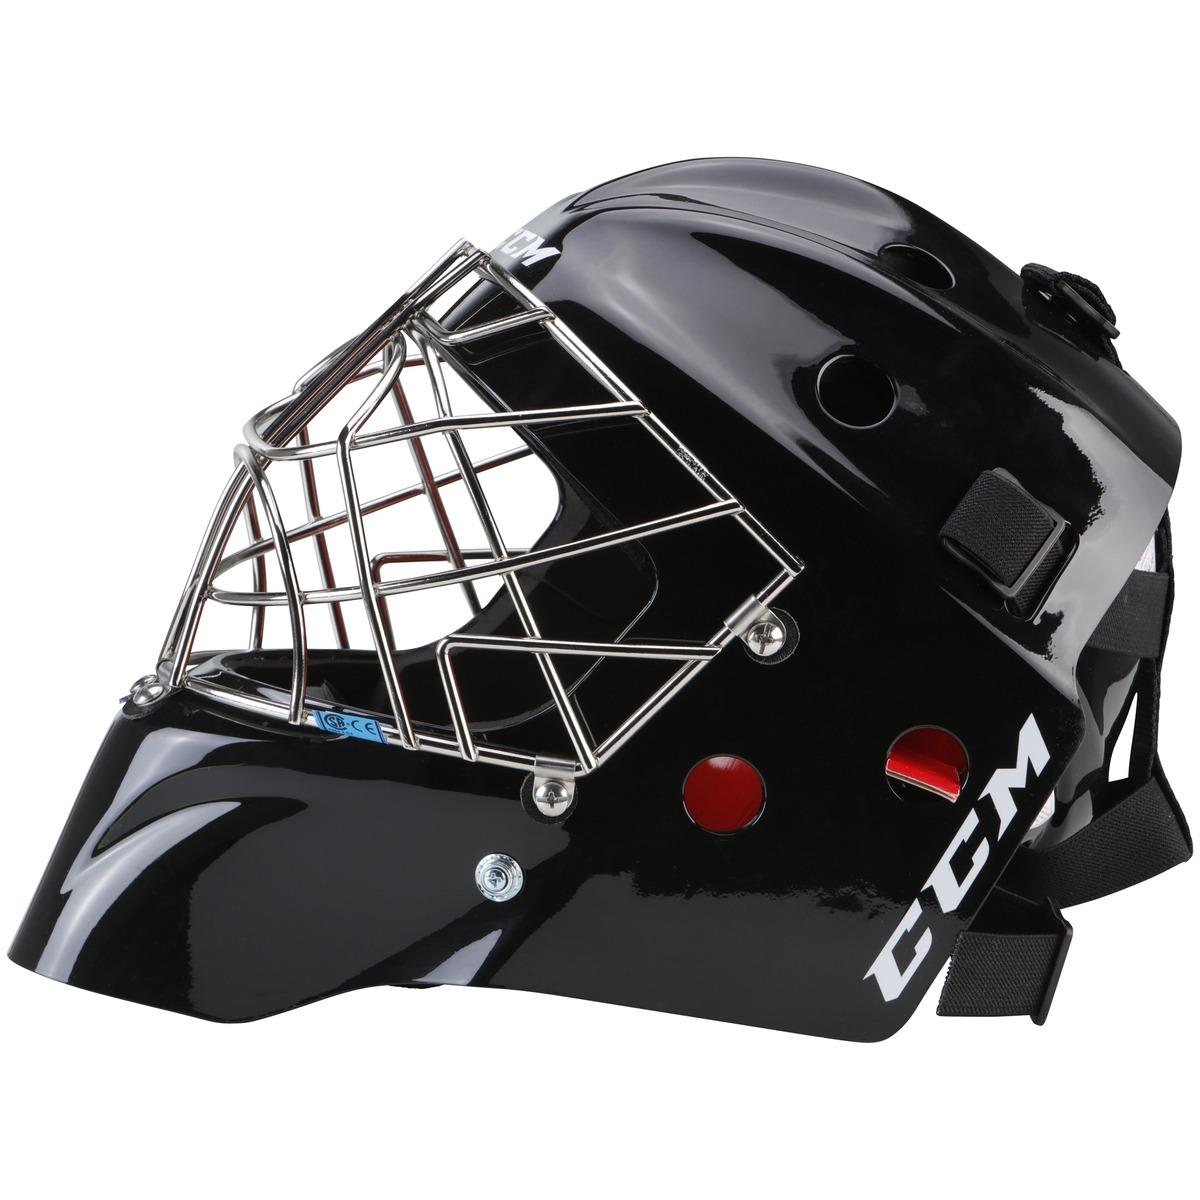 38b50ed787f Goalie mask 1.5 Sr CCE-18.  BRAND-NAME